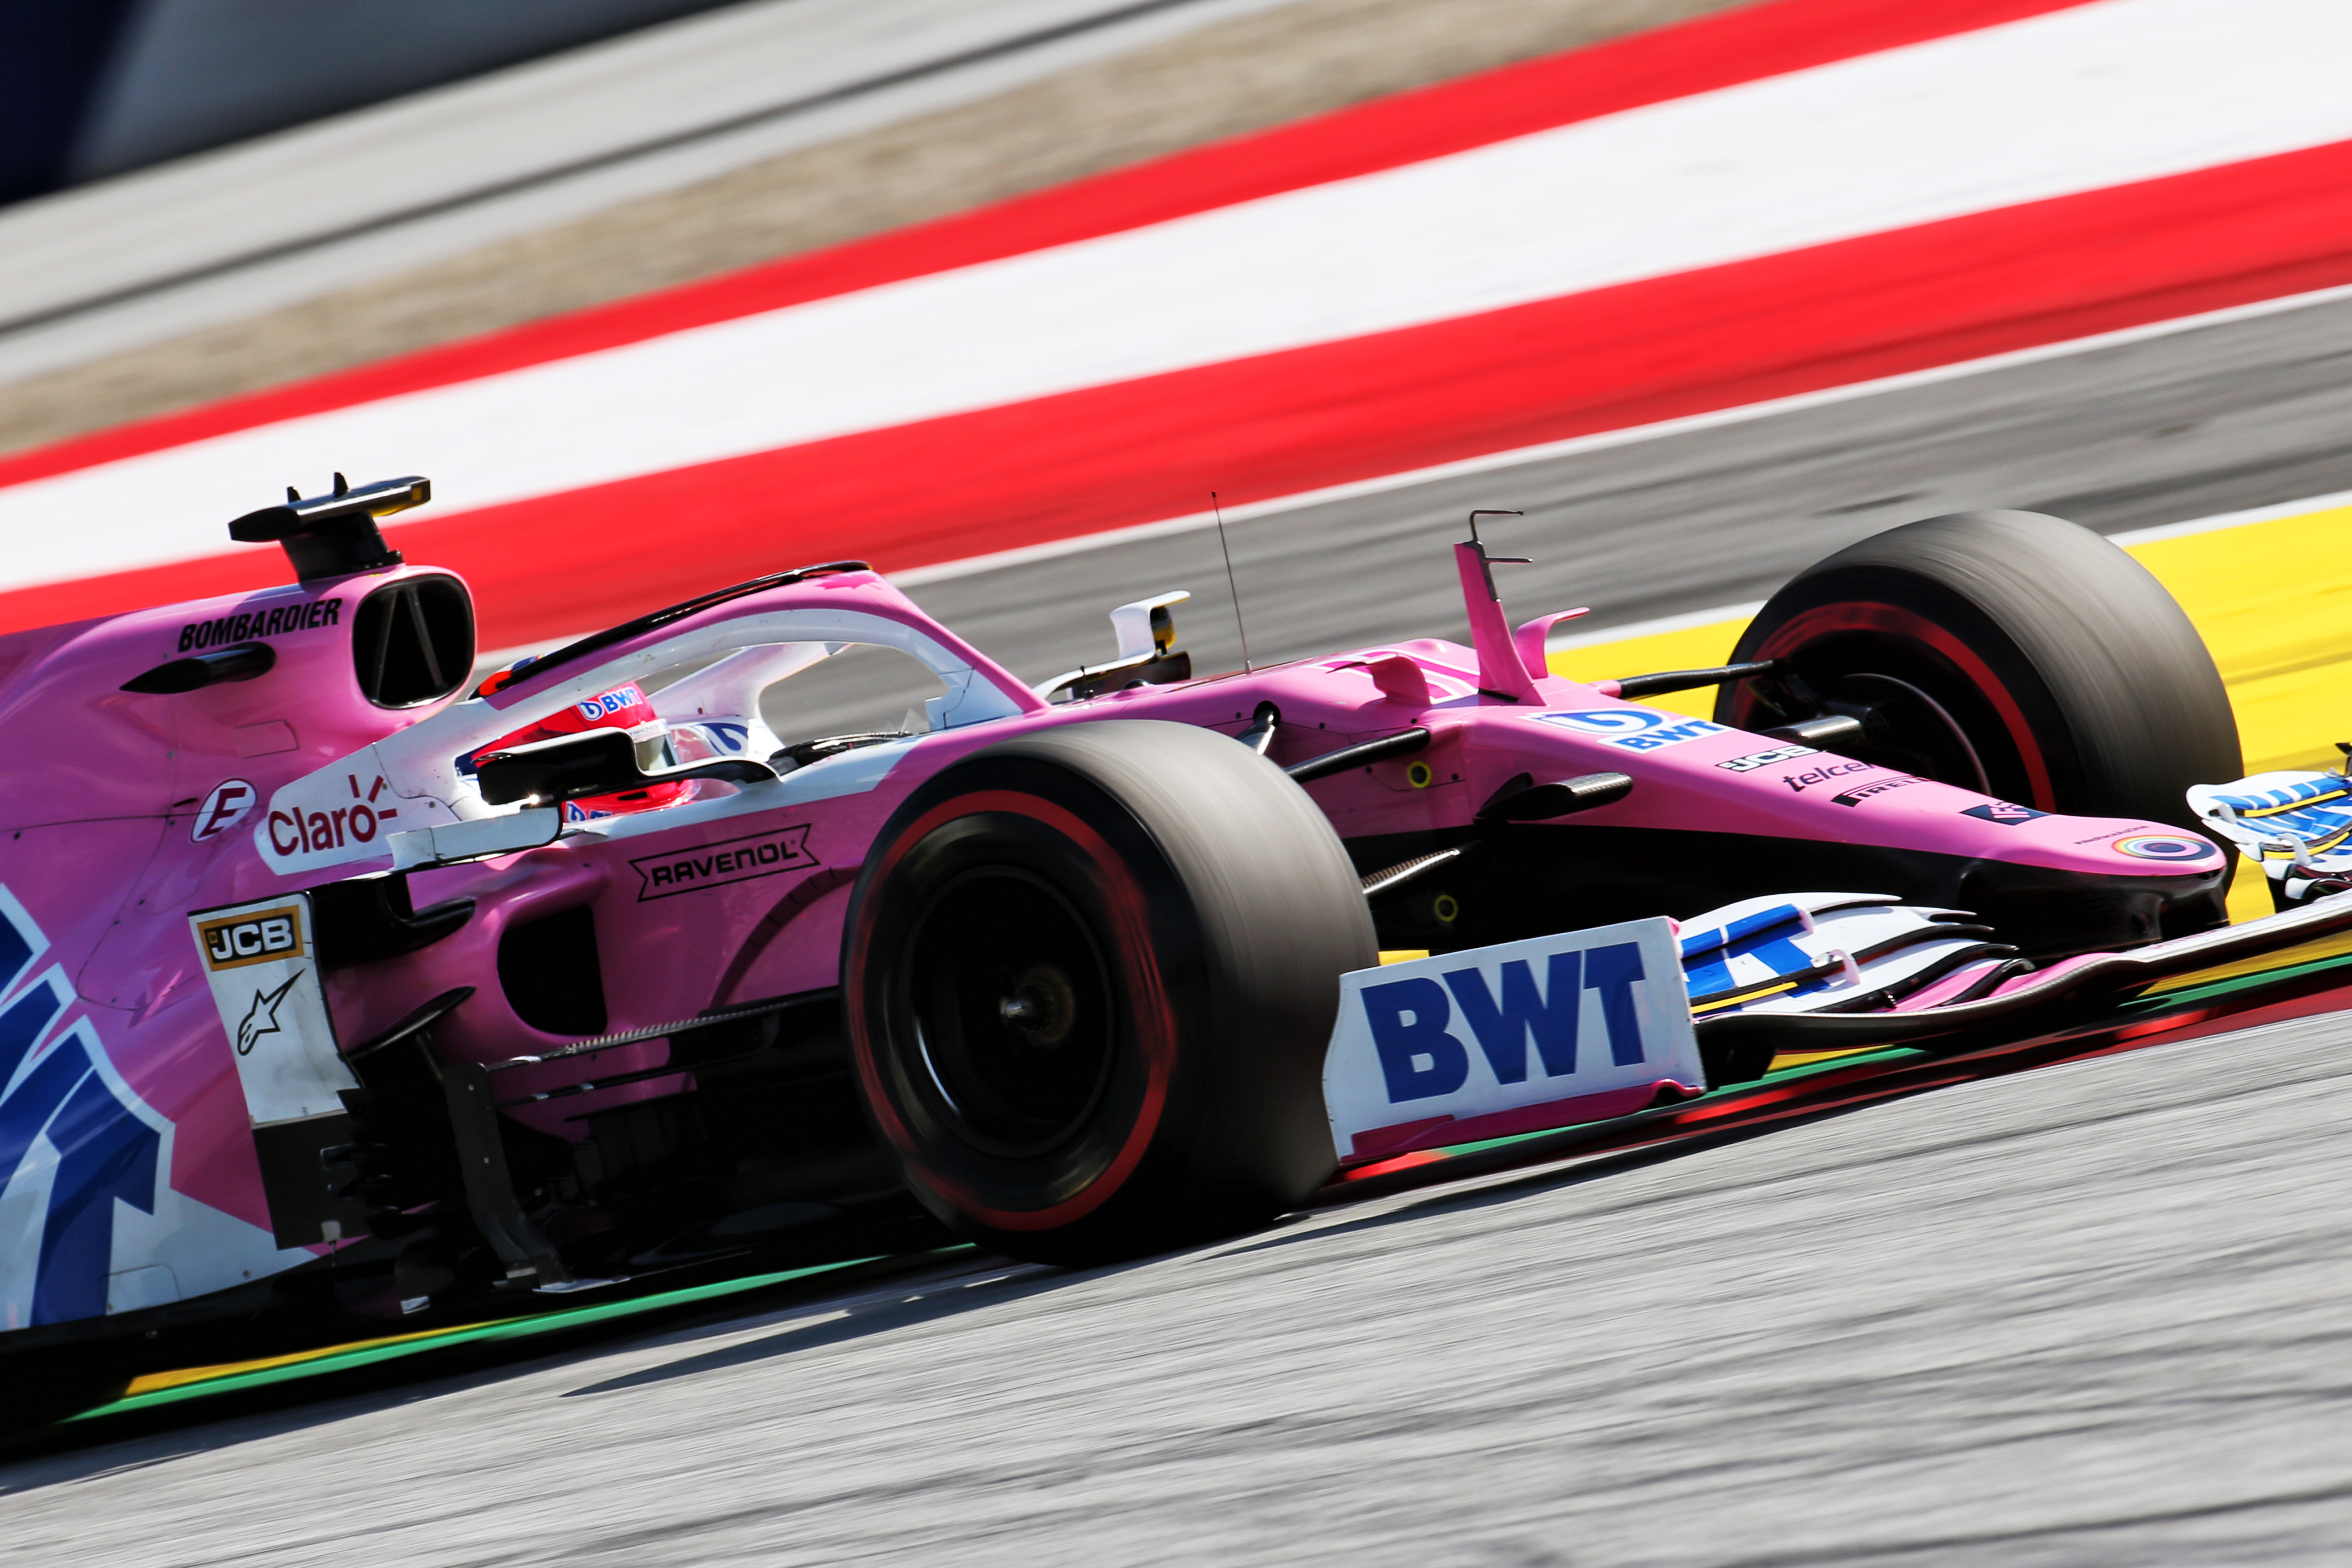 Sergio Perez Racing Point Styrian Grand Prix 2020